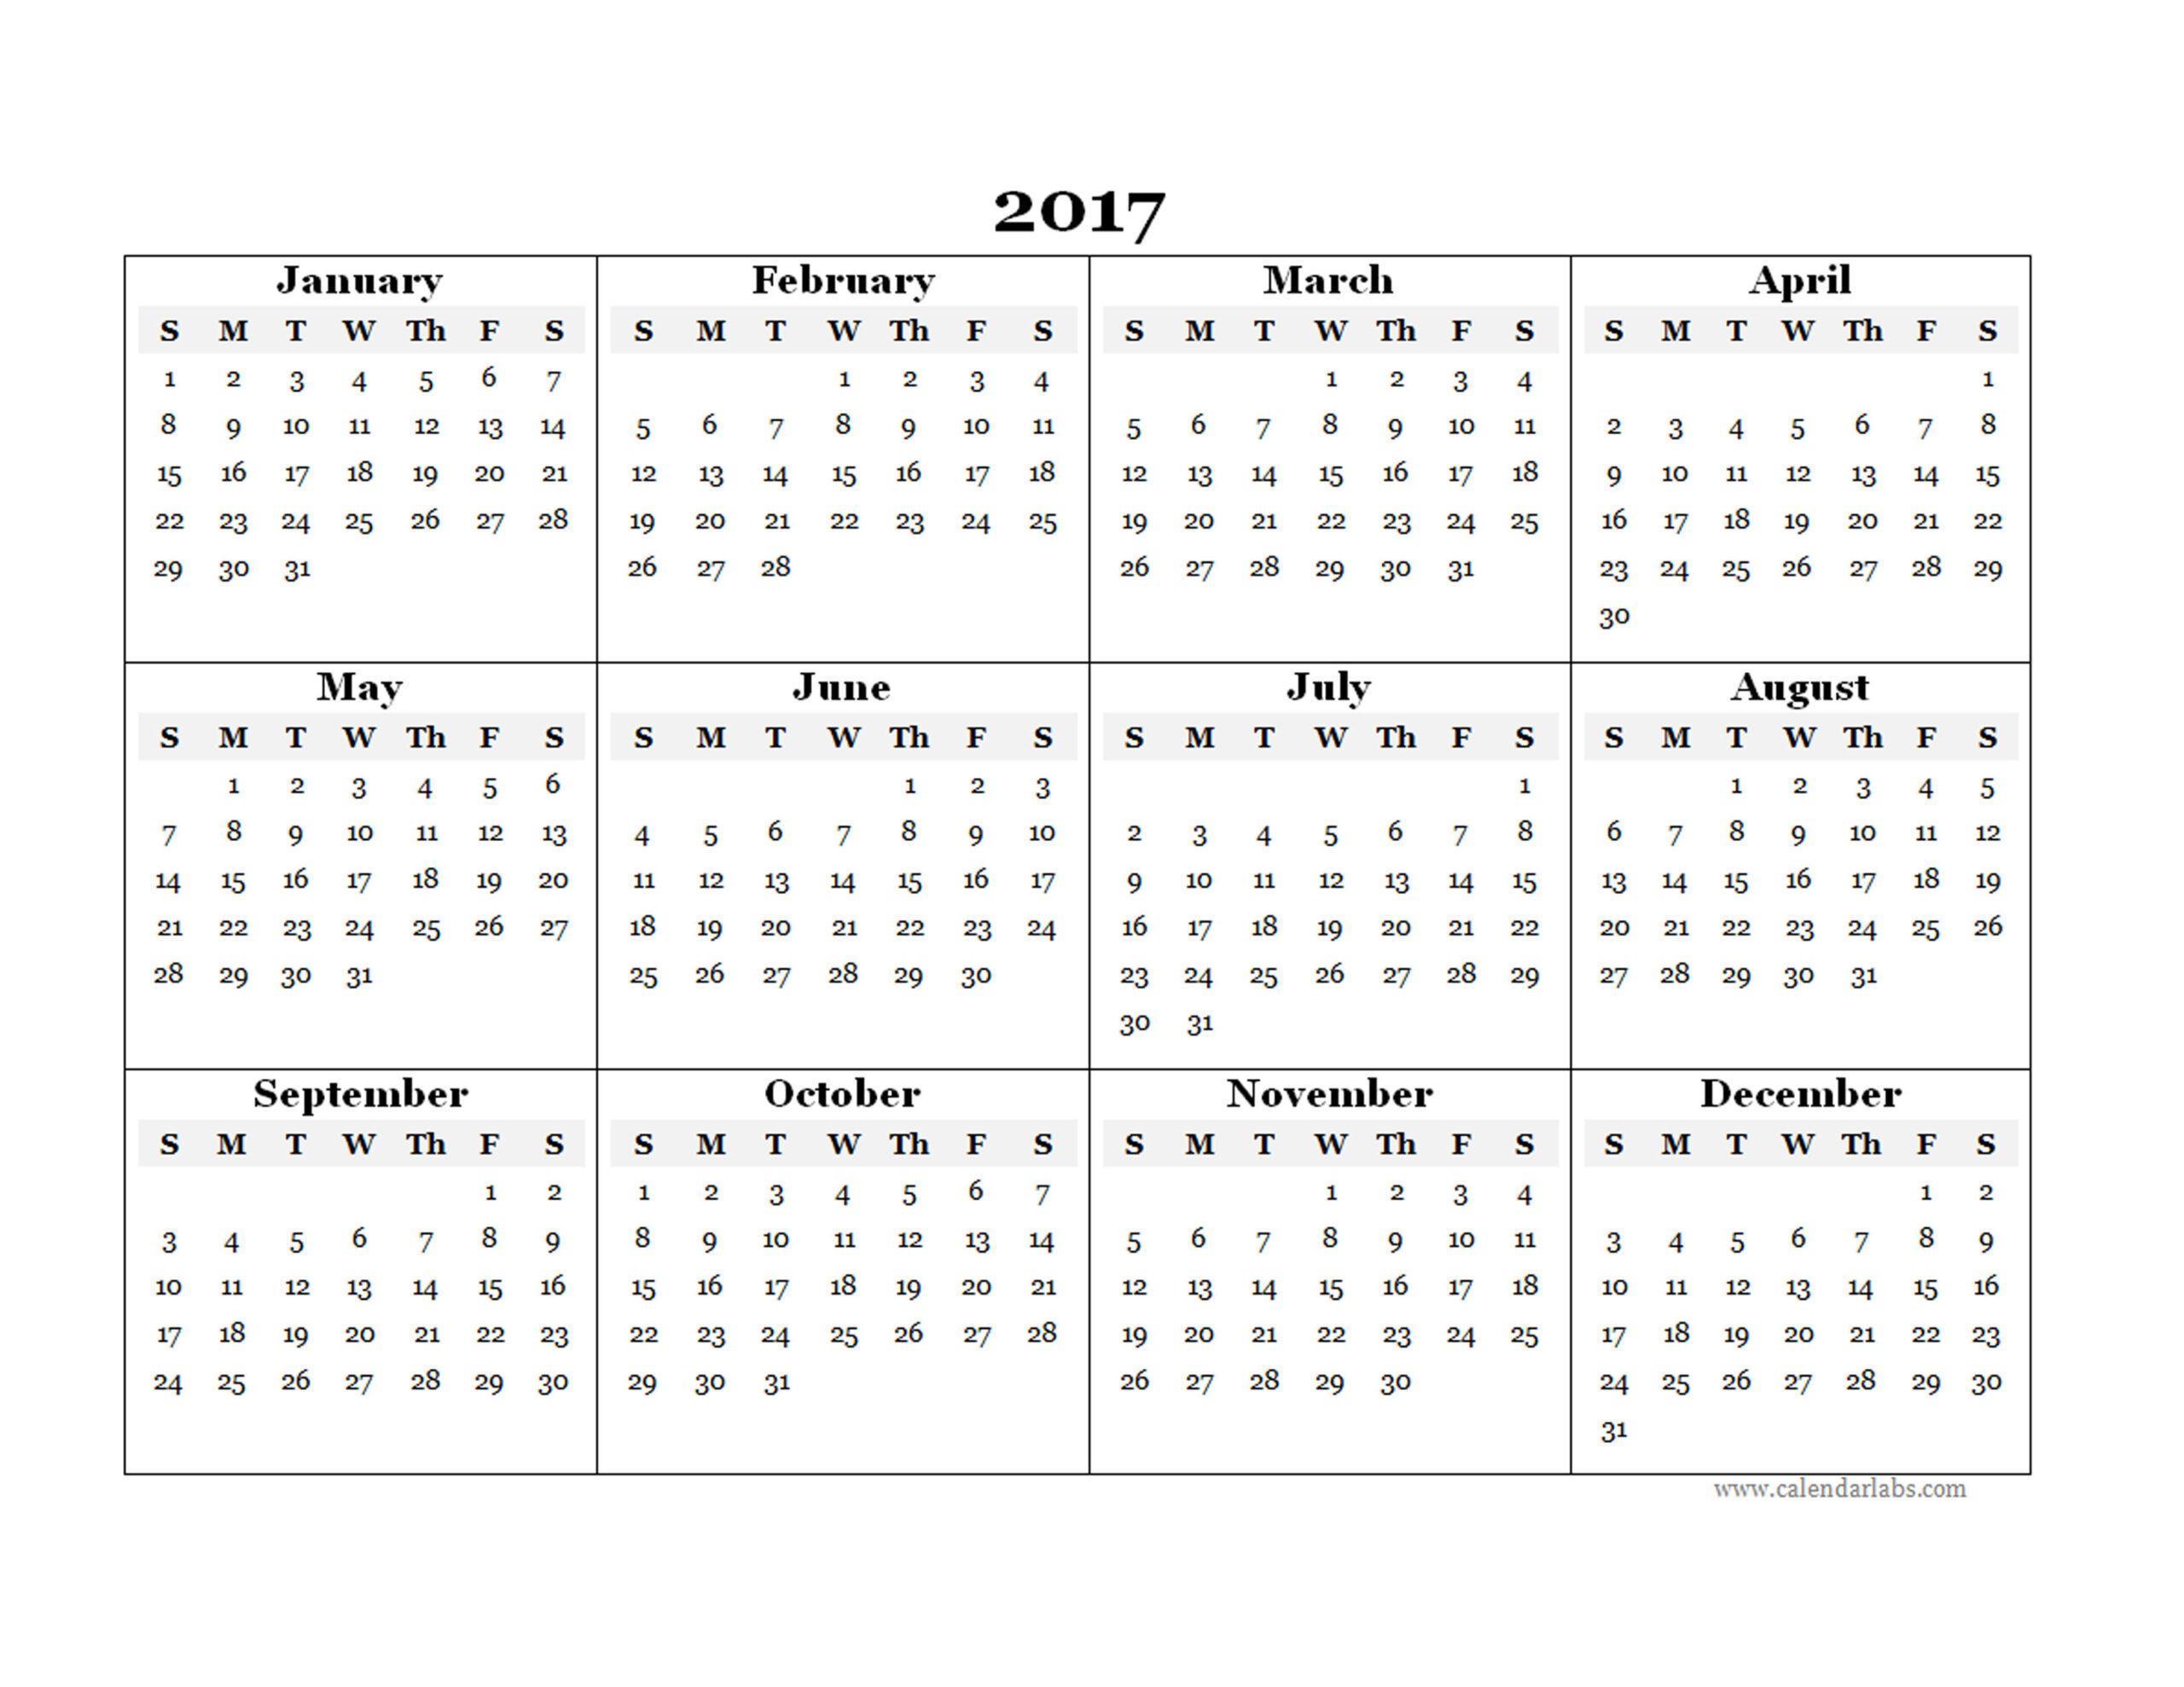 2017 Blank Yearly Calendar Template - Free Printable Templates  Yearly Calendar